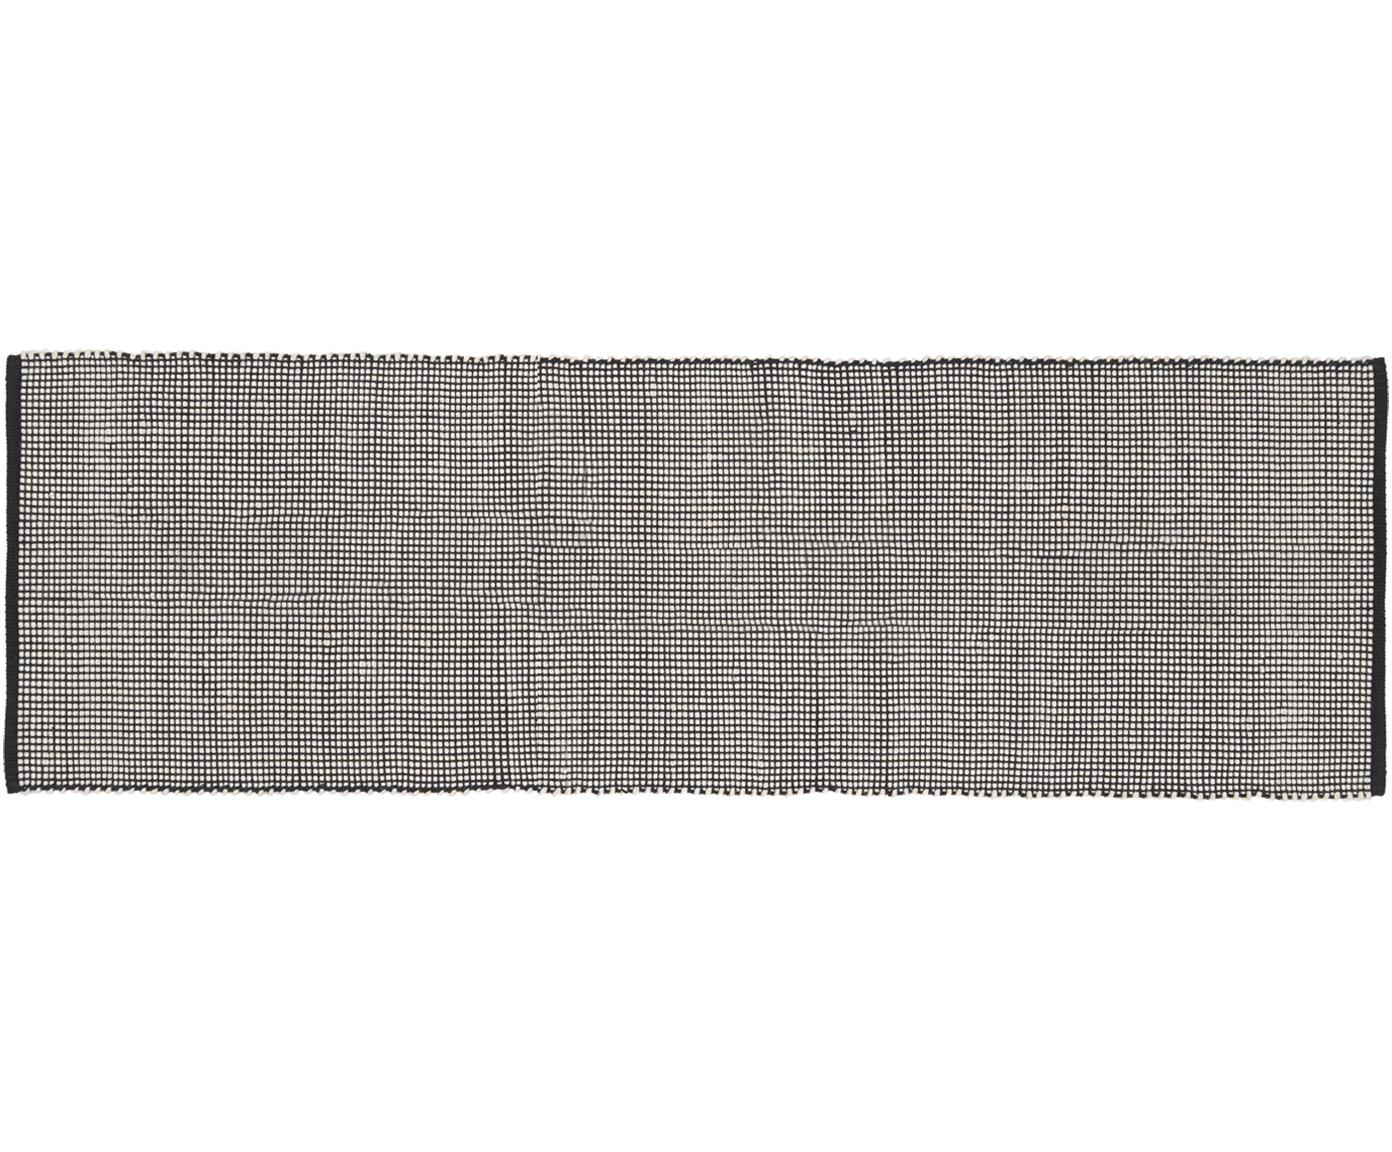 Passatoia in lana tessuta a mano Amaro, 38% lana, 22% poliestere, 20% cotone, 20% poliammide, Nero, crema, Larg. 80 x Lung. 250 cm